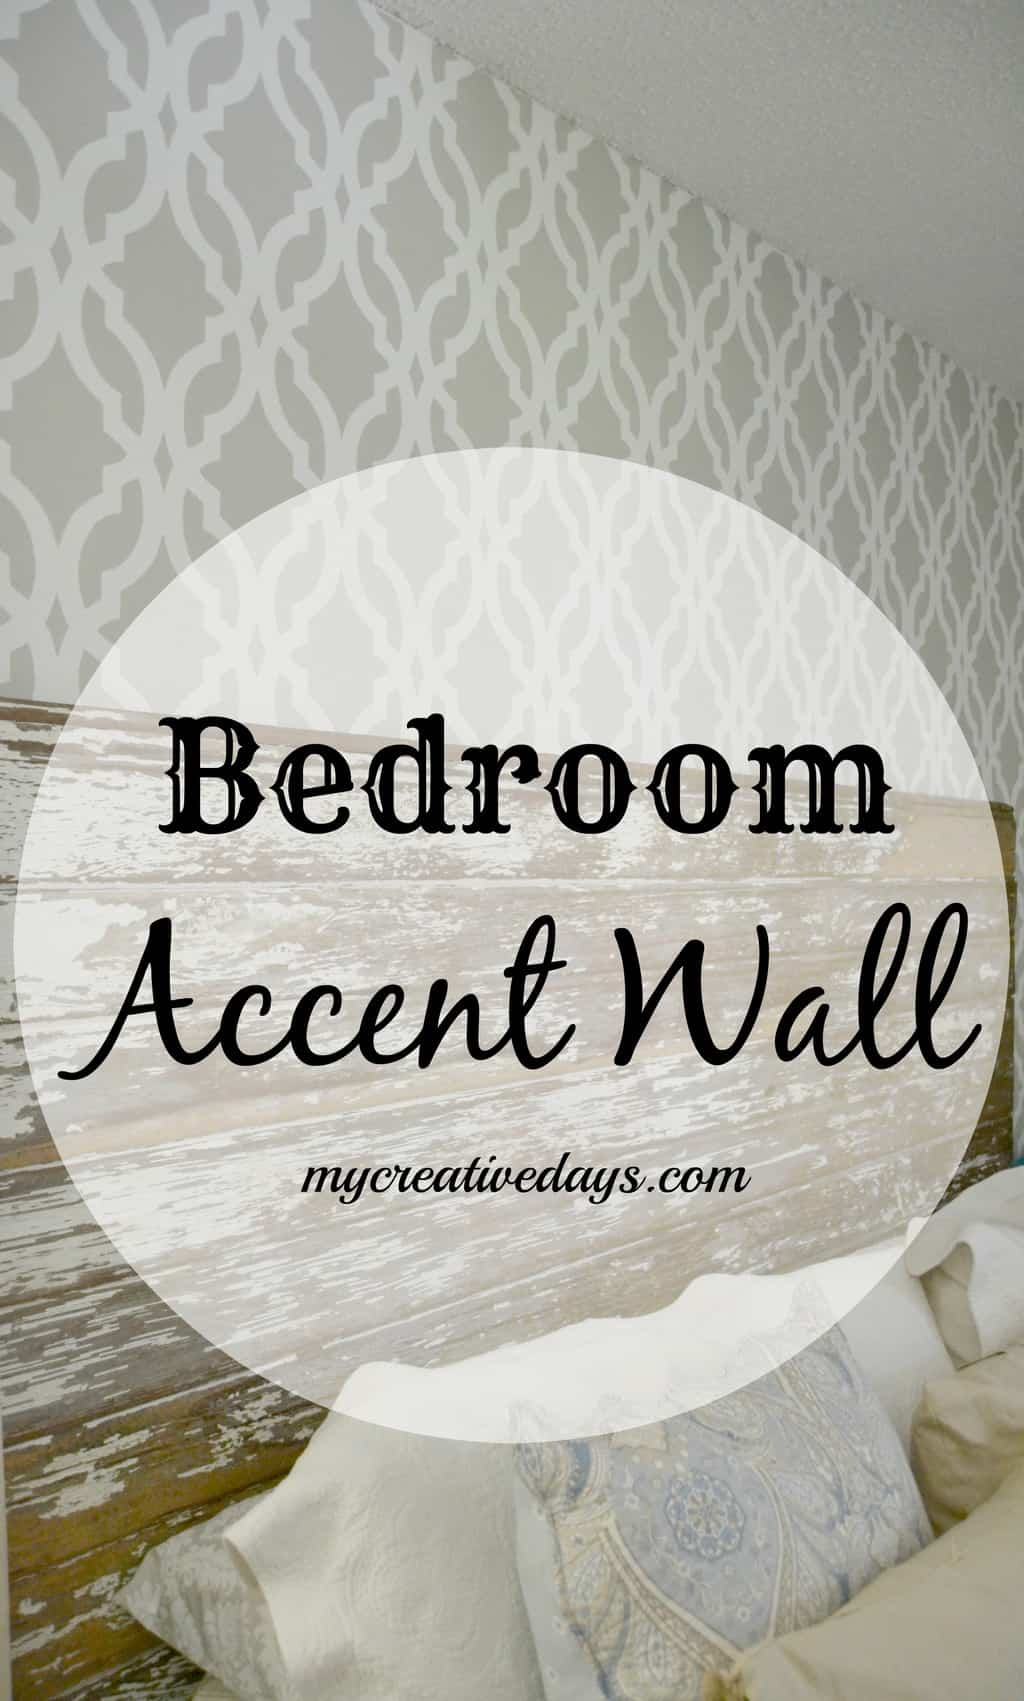 Bedroom Accent Wall mycreativedays.com